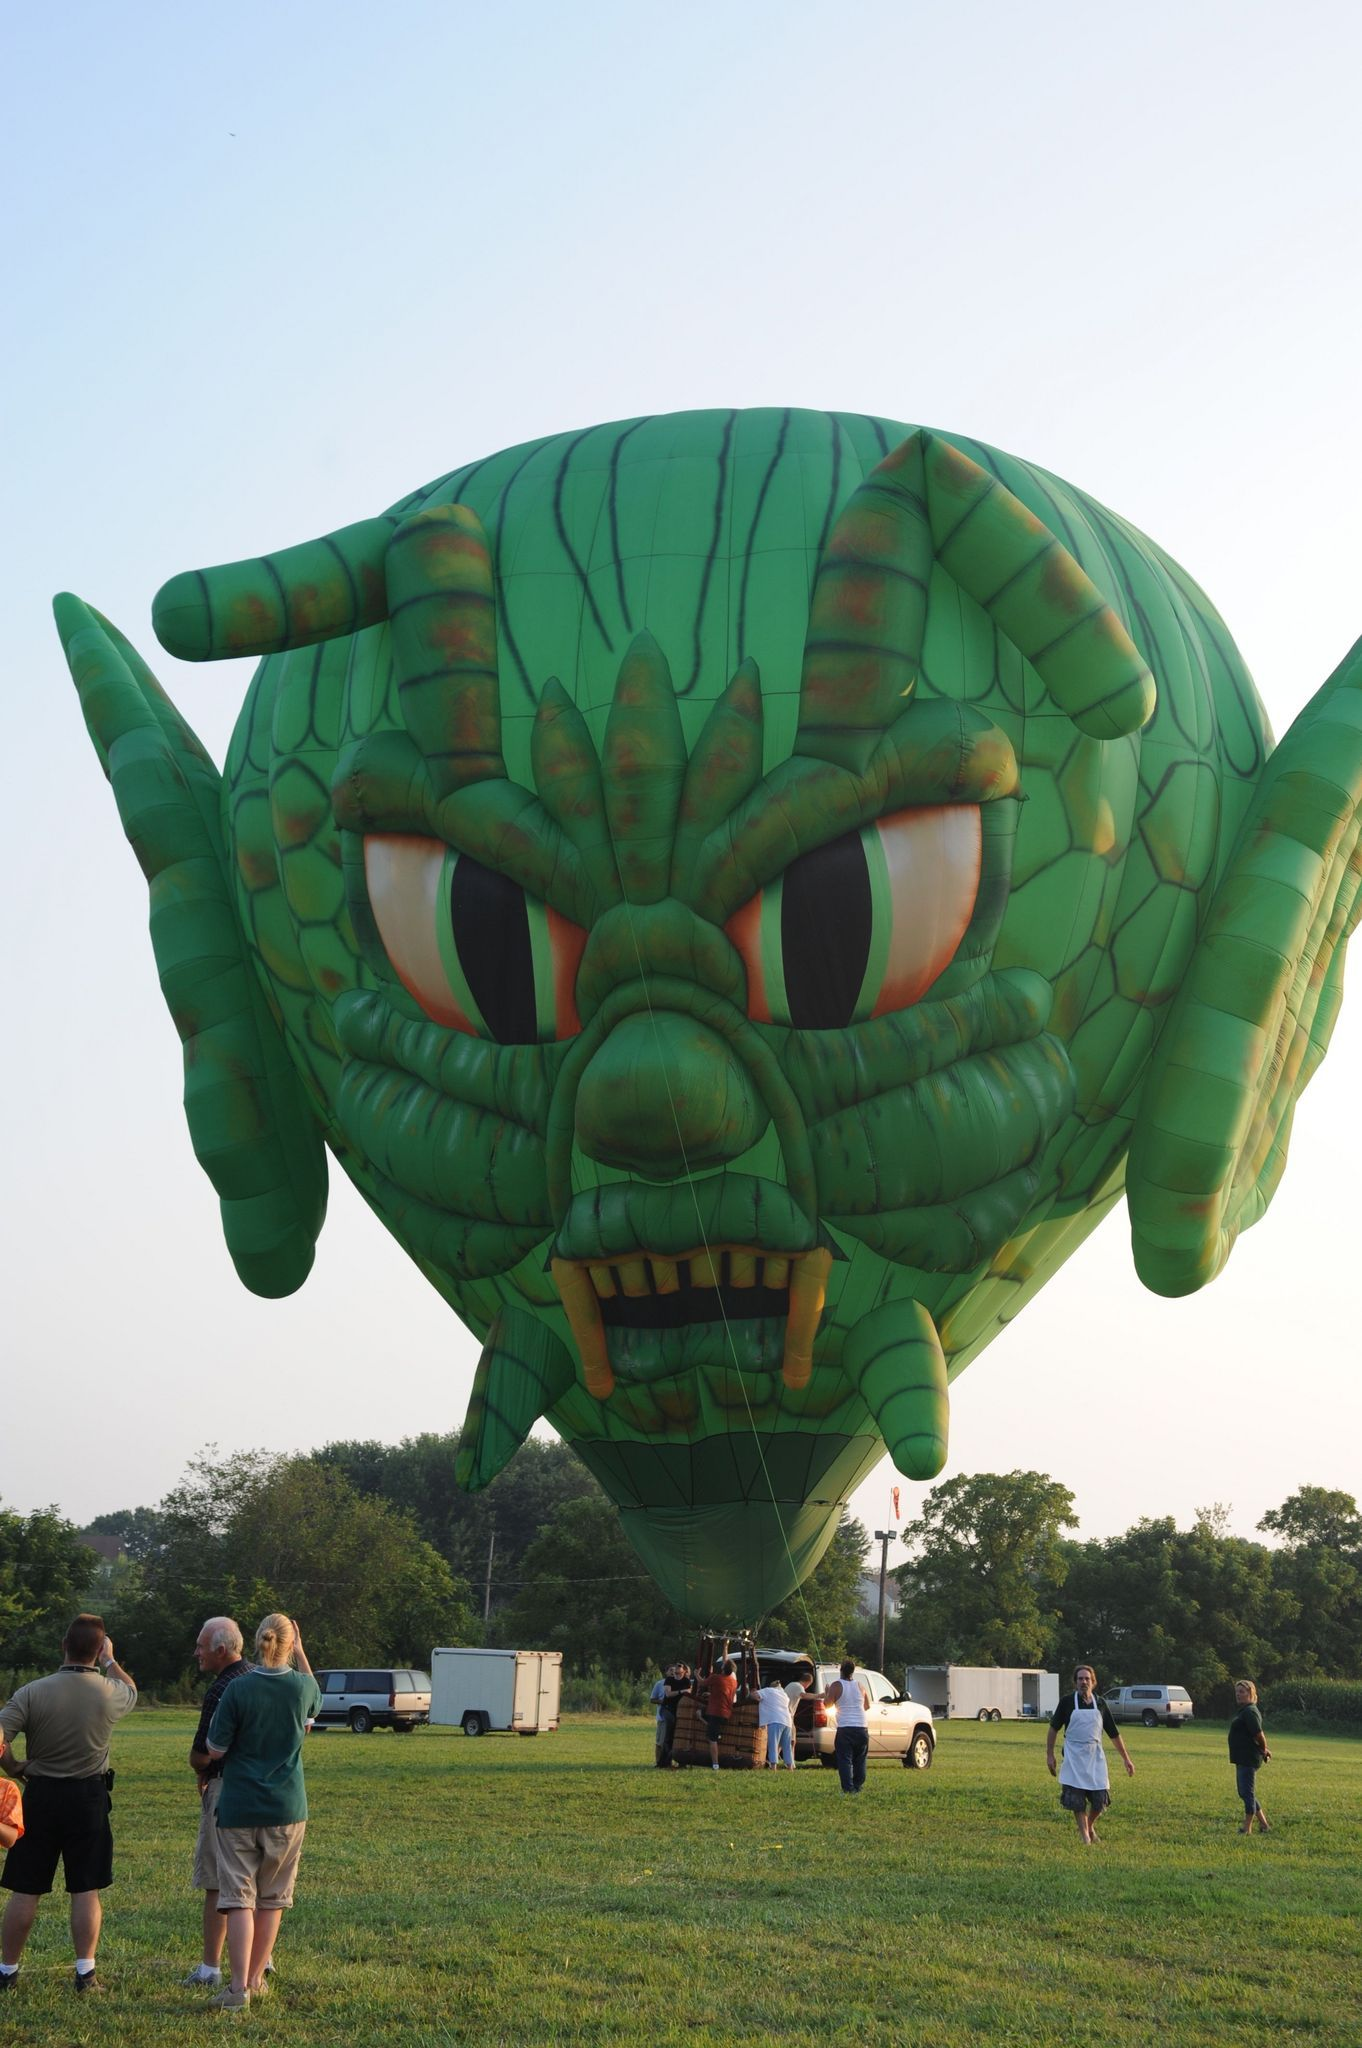 Pin by Mz Packrat on Hot Air Balloons Hot air balloon